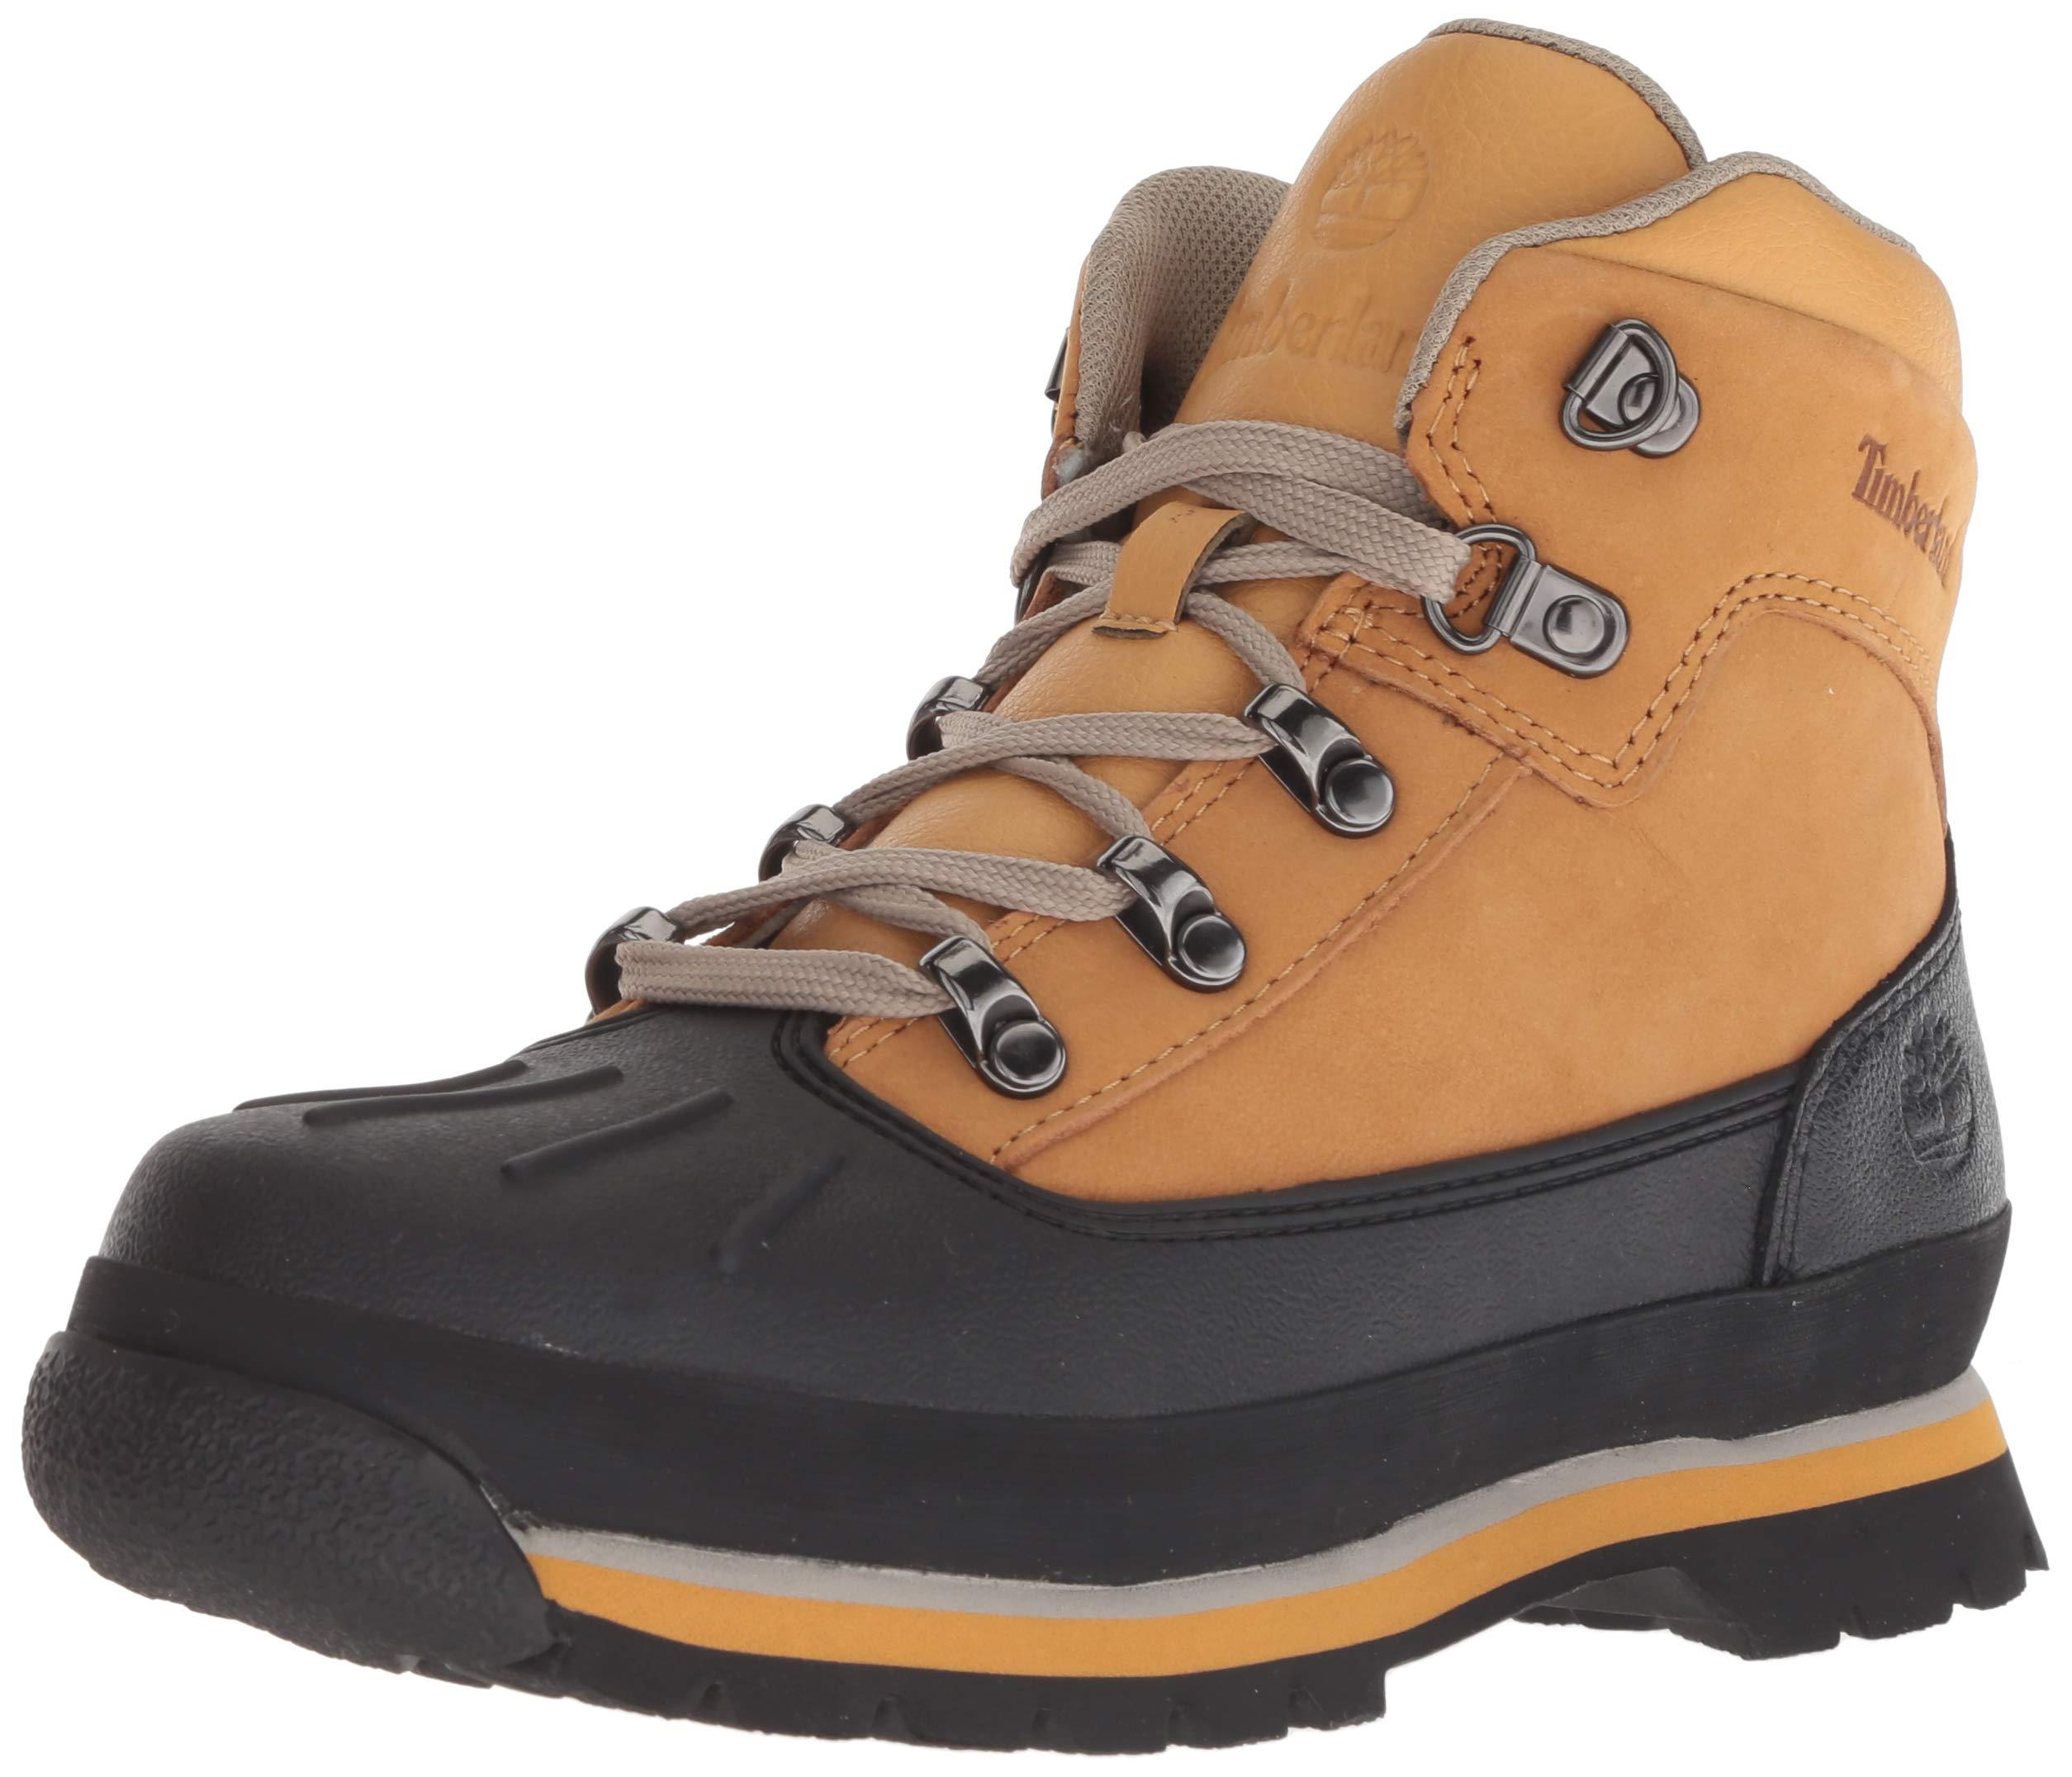 Timberland Unisex Euro Hiker Shell Toe Fashion Boot, Wheat Nubuck, 12.5 Medium US Little Kid